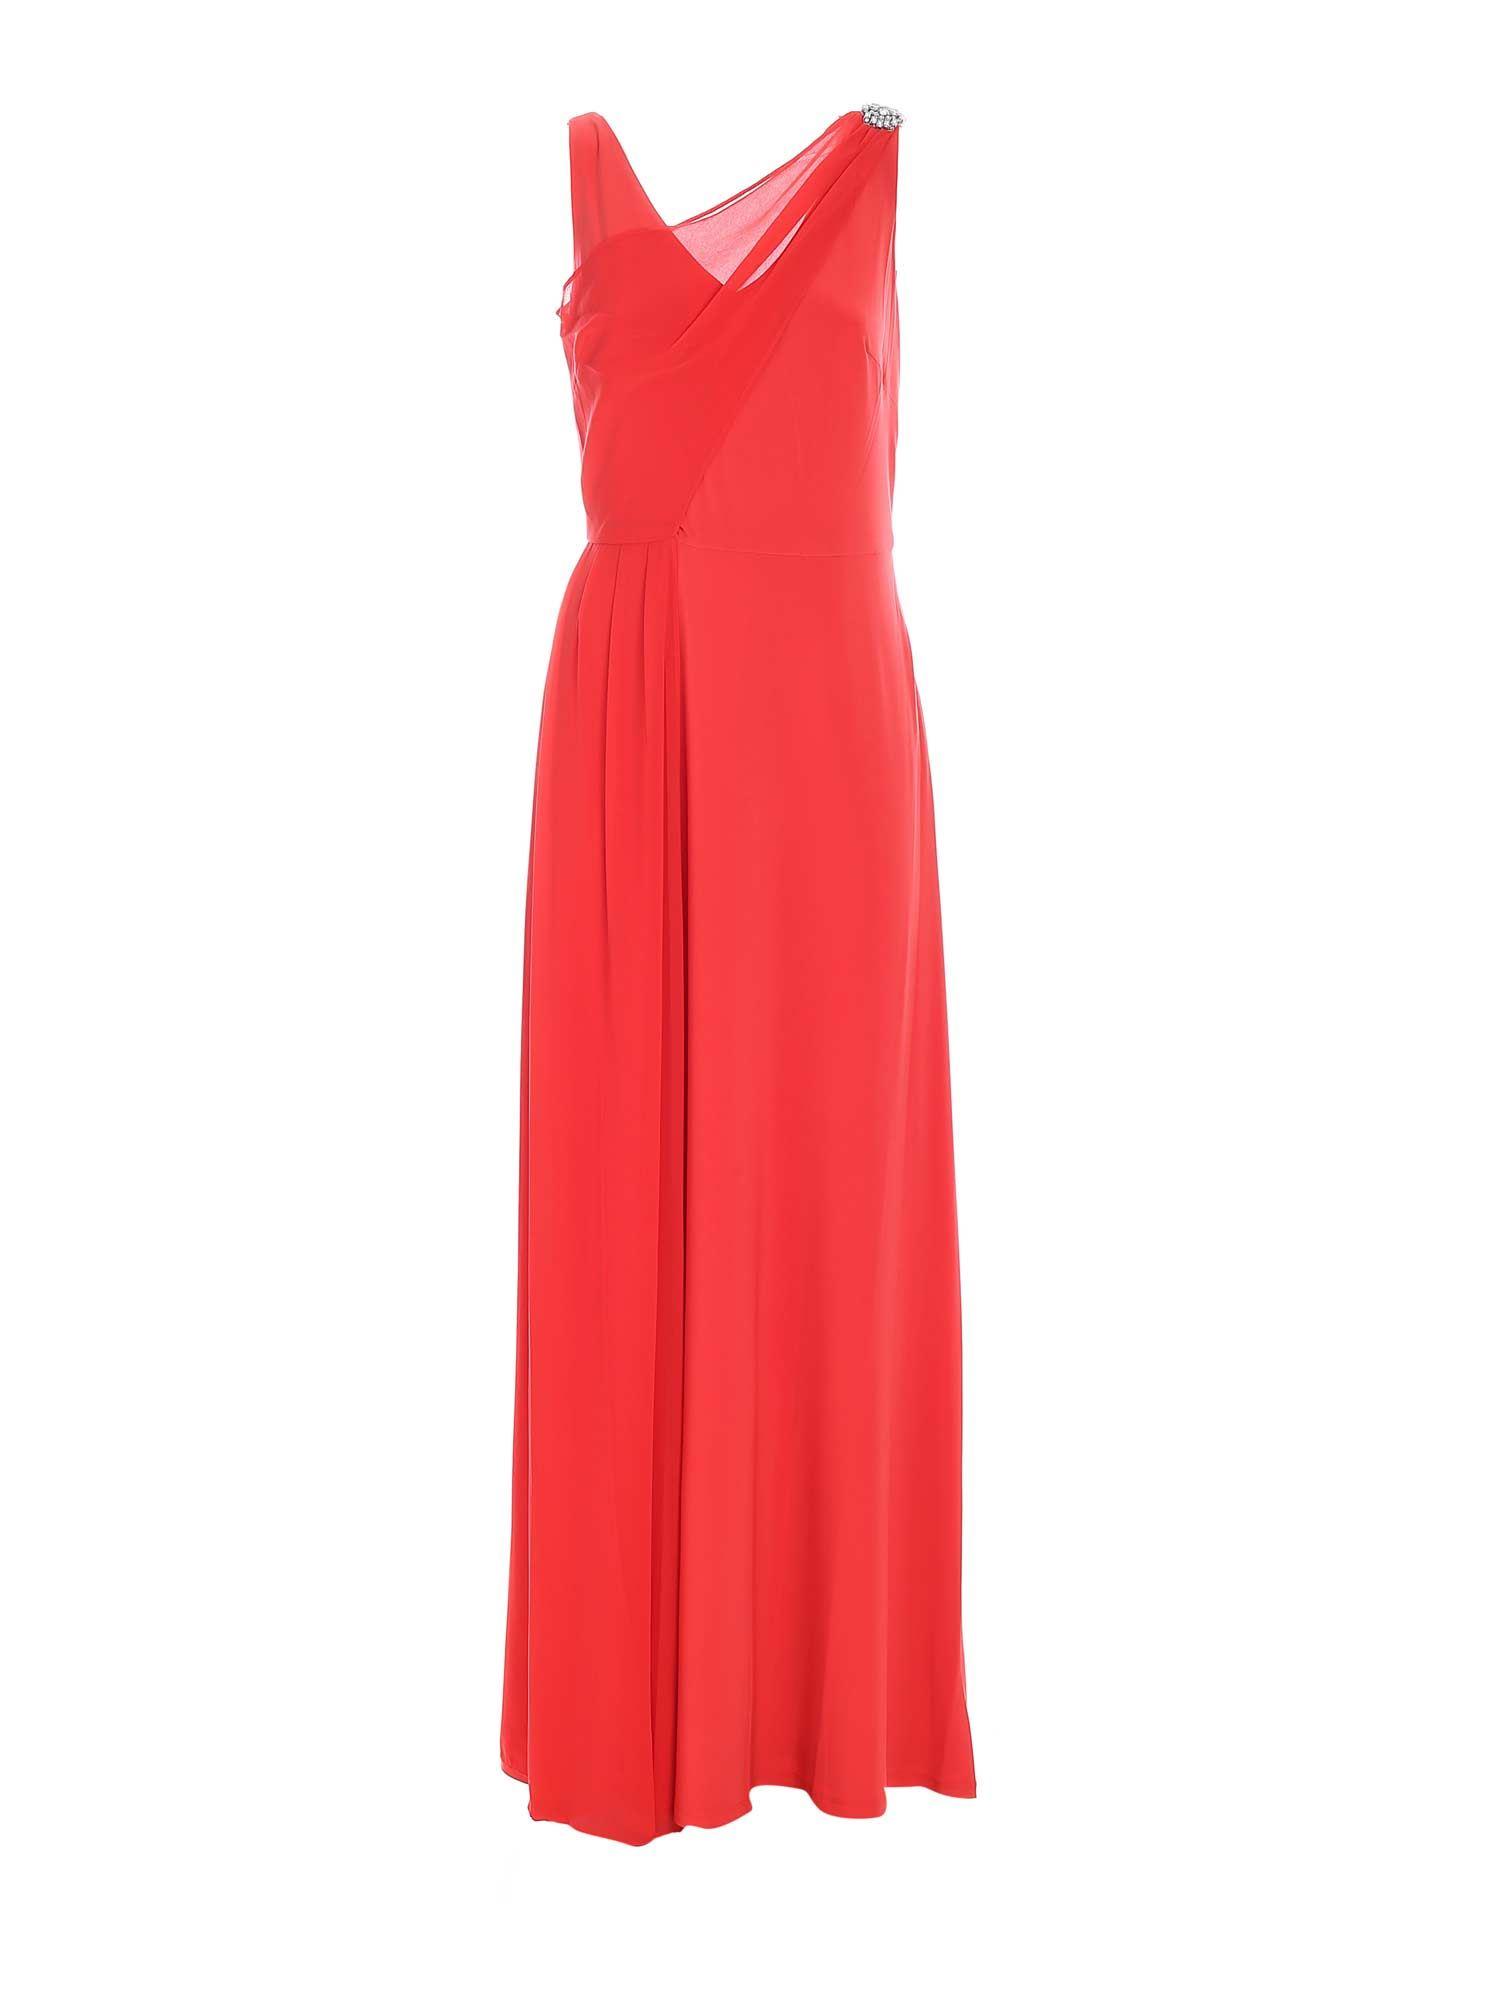 RHINESTONE DETAIL LONG DRESS IN RED POLO RALPH LAUREN | 11 | 253830084003